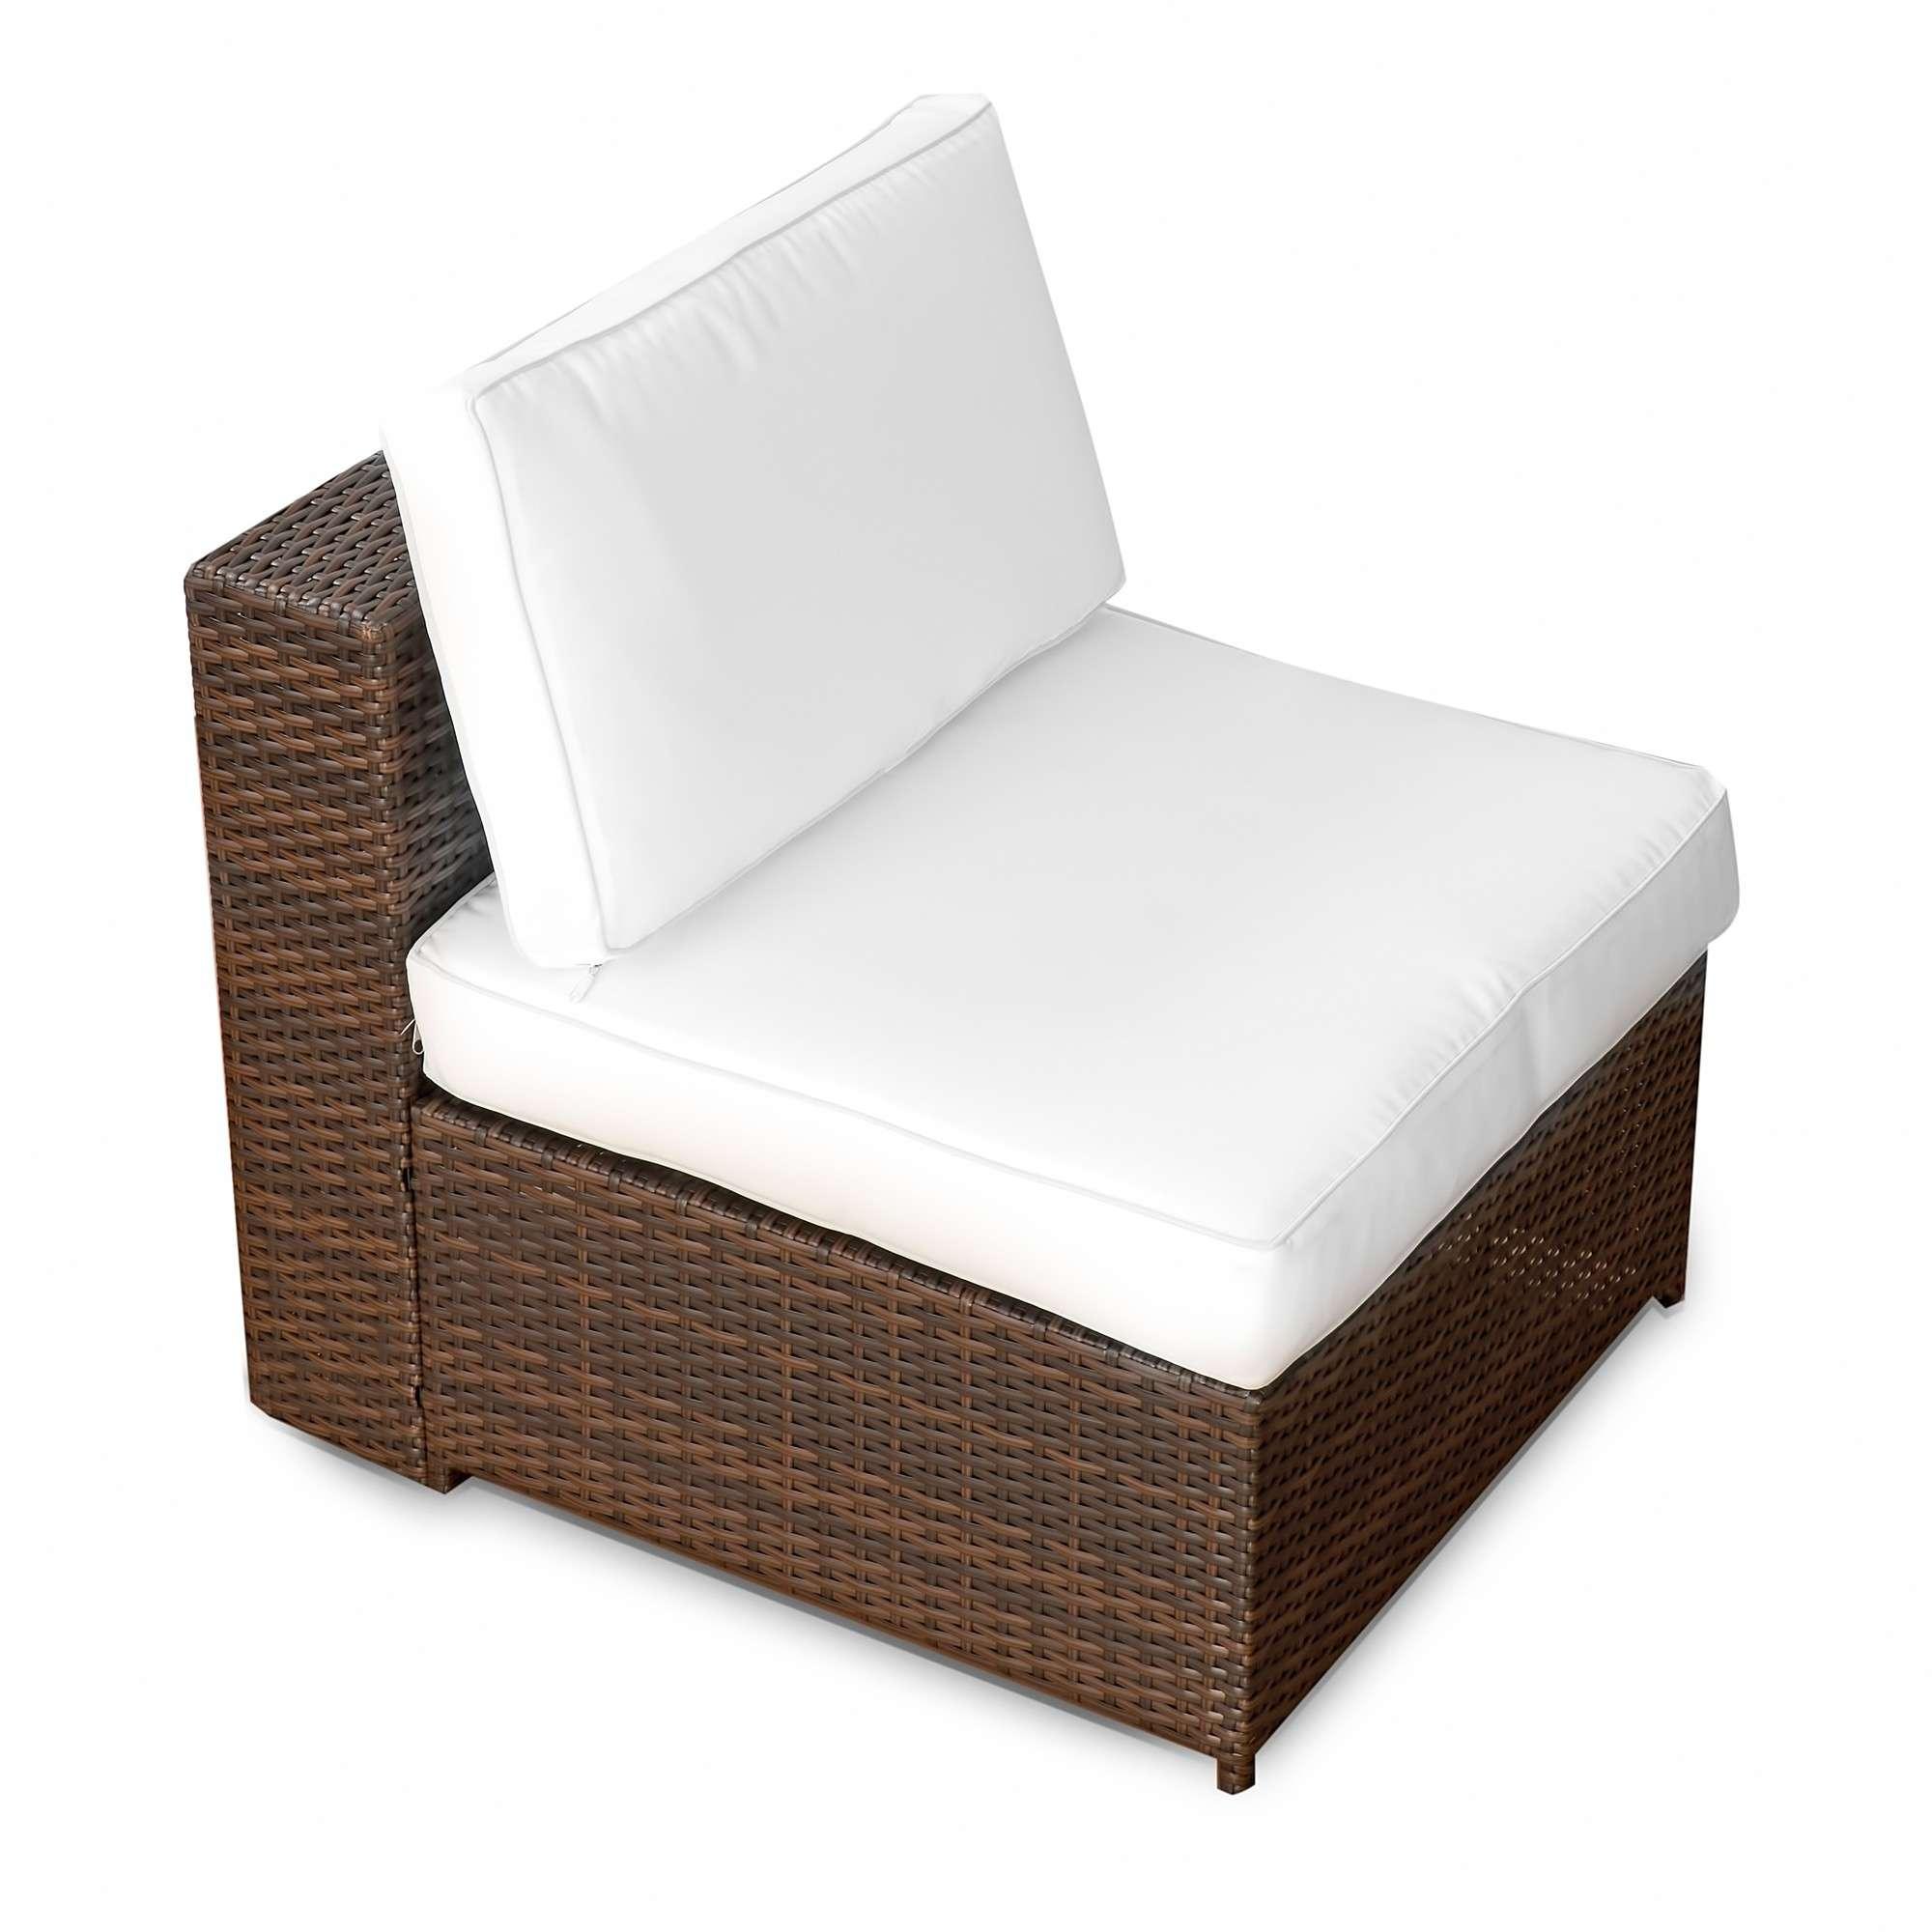 Lounge sessel garten  Lounge Sessel Garten ▻ günstig ◅ Garten Lounge Sessel kaufen